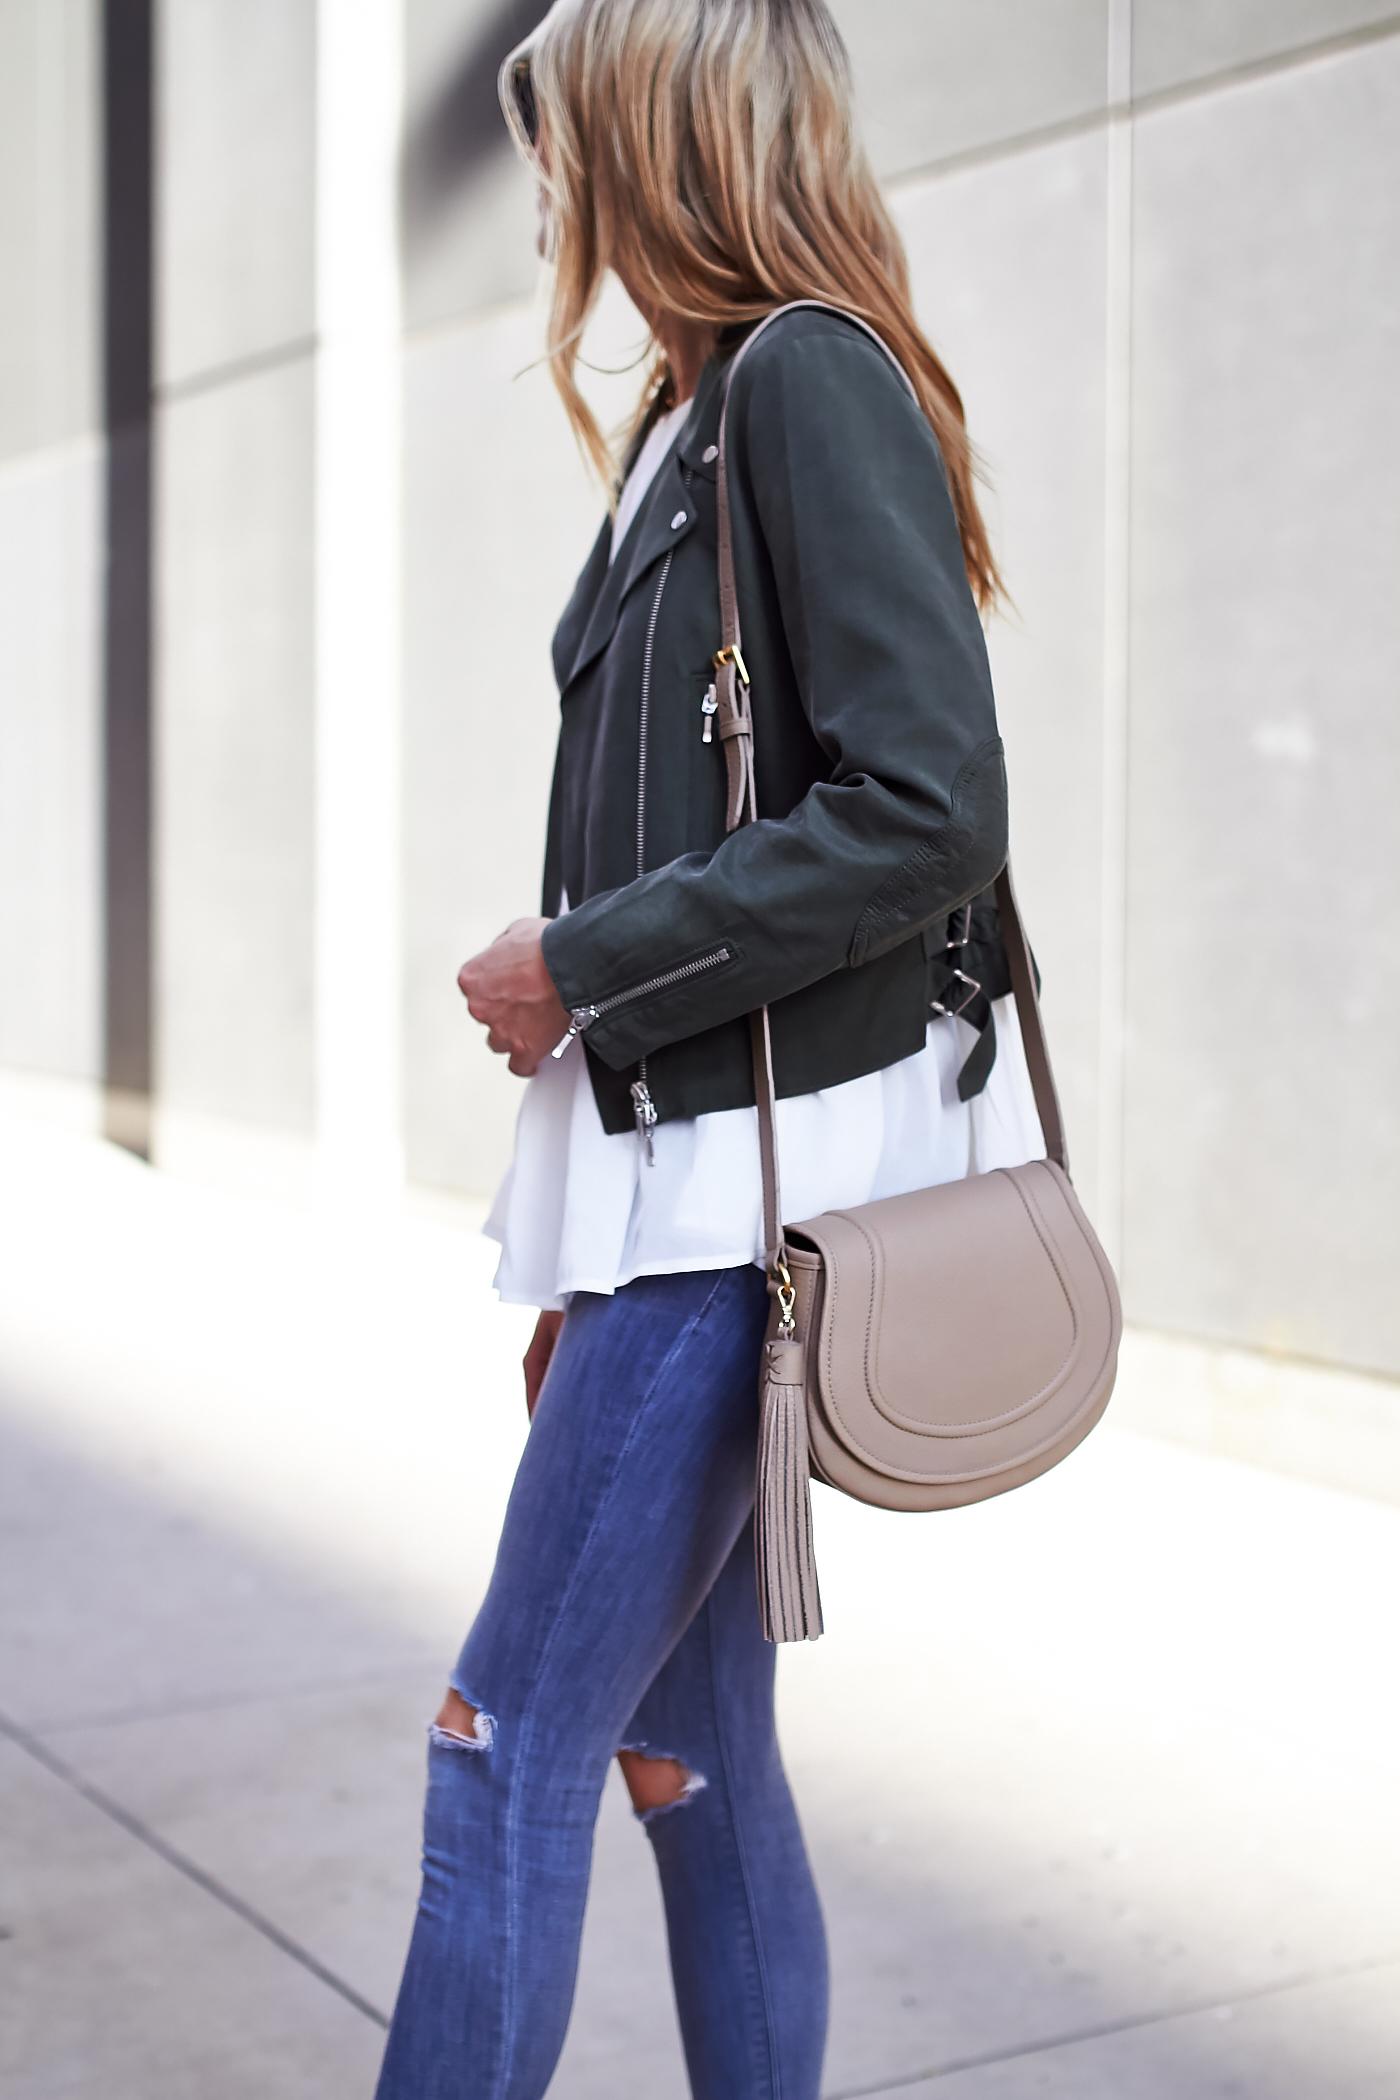 fashion-jackson-club-monaco-kapri-moto-jacket-ripped-denim-skinny-jeans-gigi-new-york-jenni-saddle-handbag-denim-ripoped-skinny-jeans